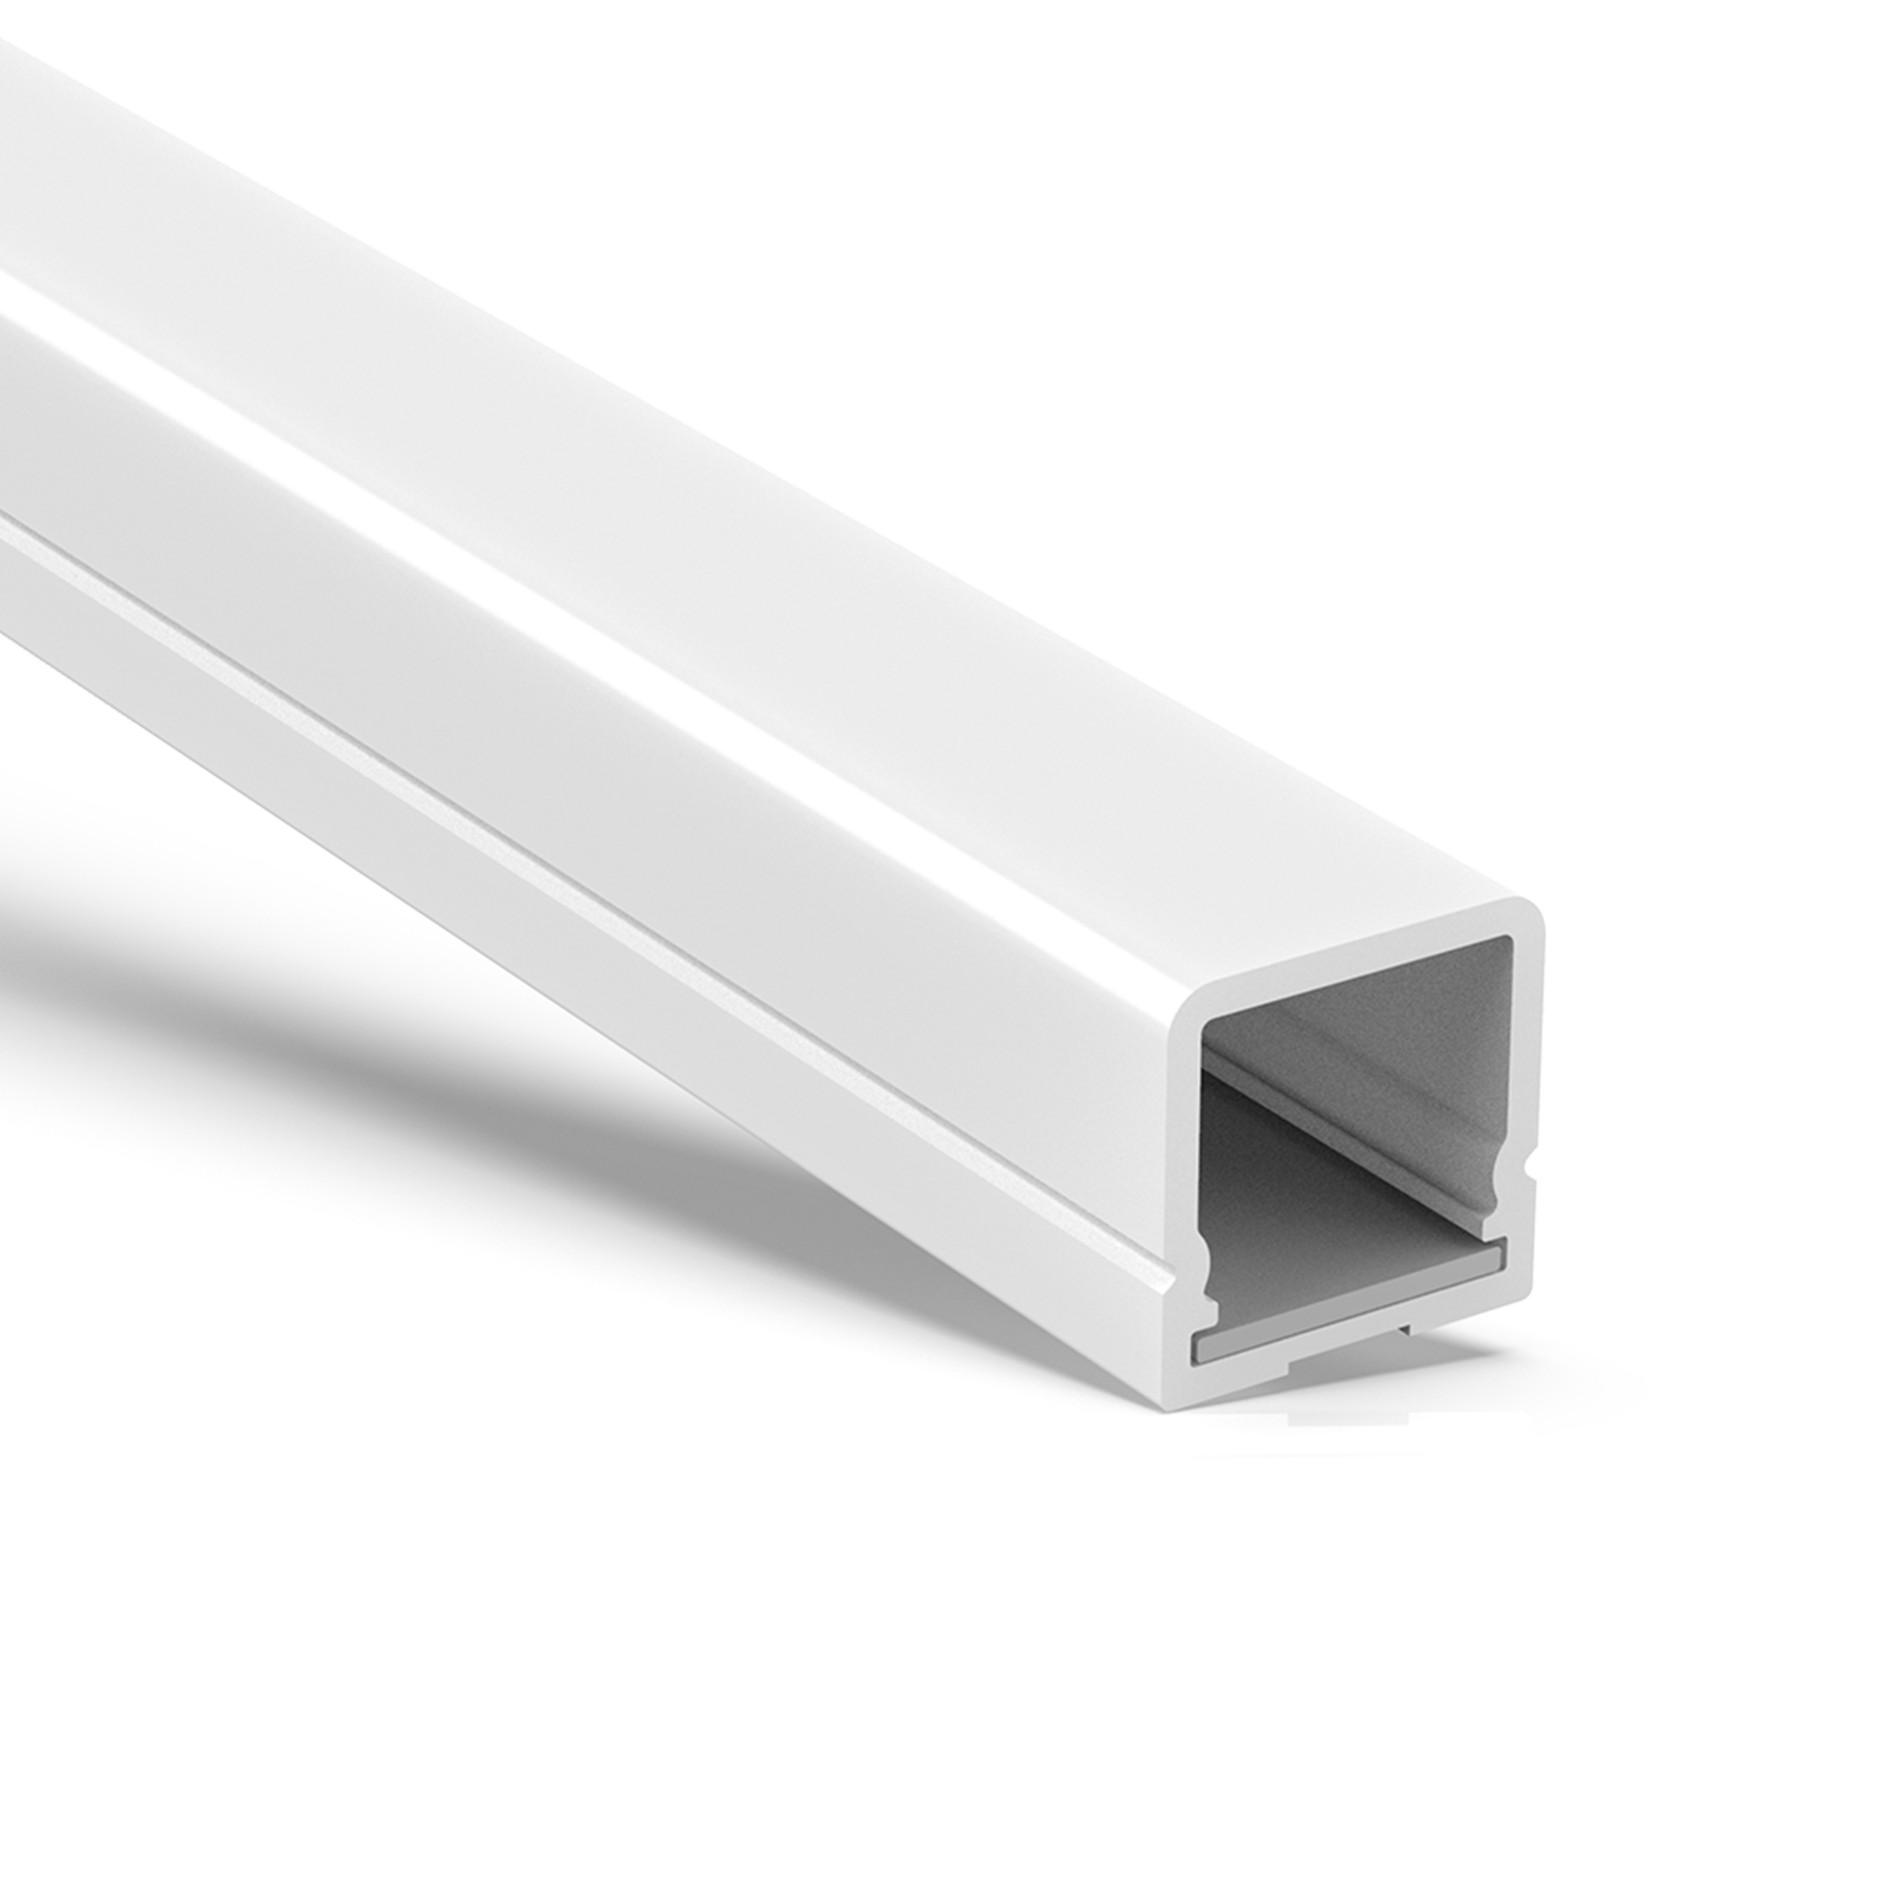 WP2 IP67 Nennprofil LED-Licht 17x17mm